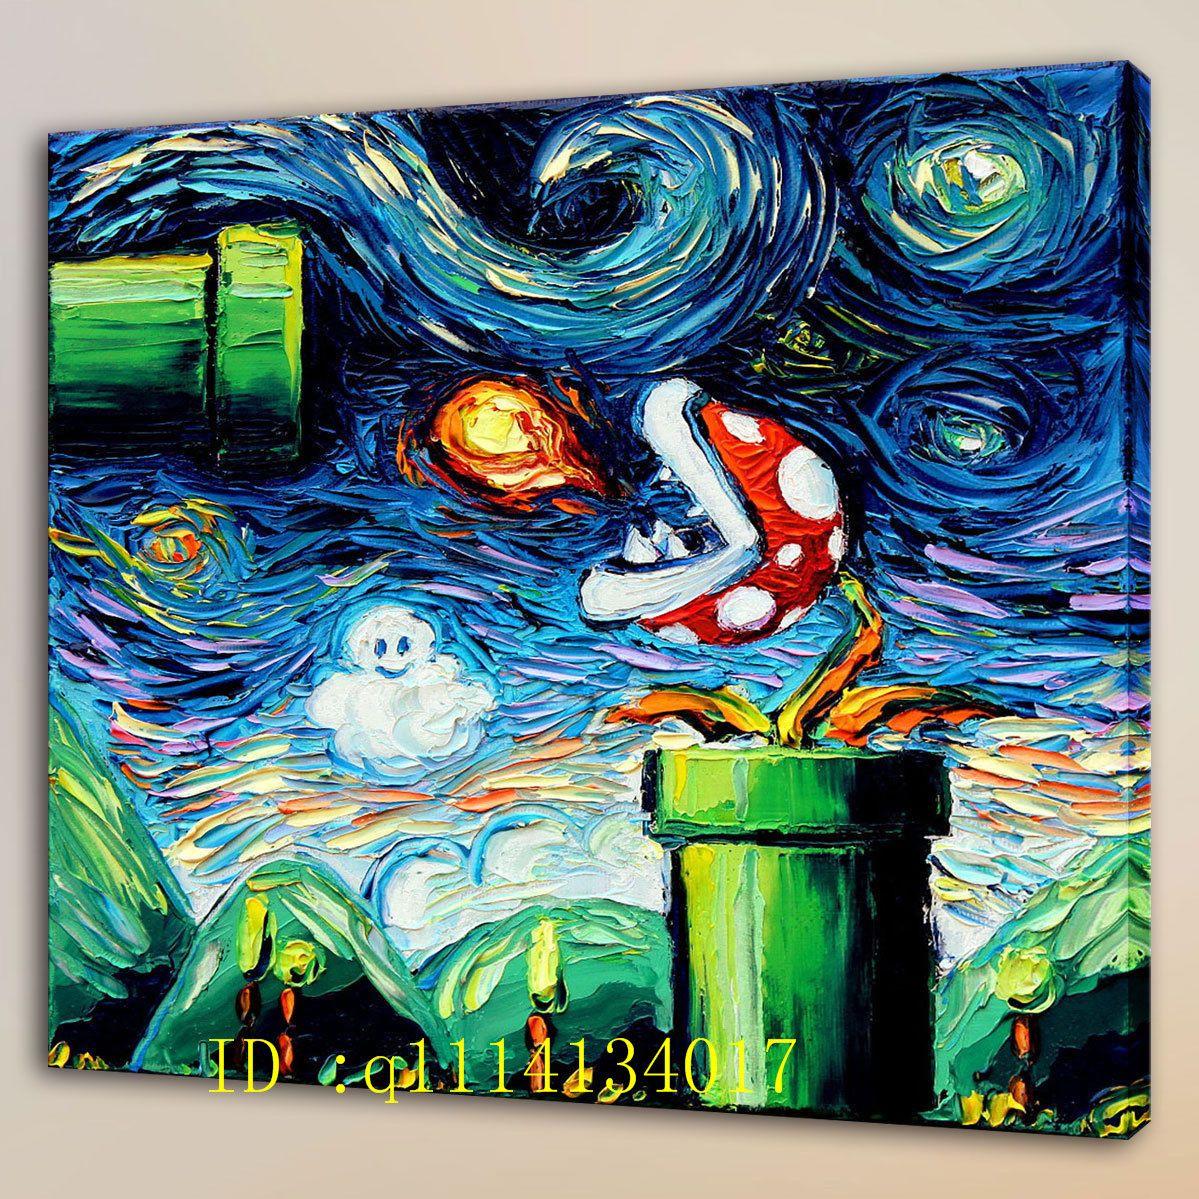 HD Print Van Gogh Mario Art Home Wall Decor Oil Painting on Canvas Unframed